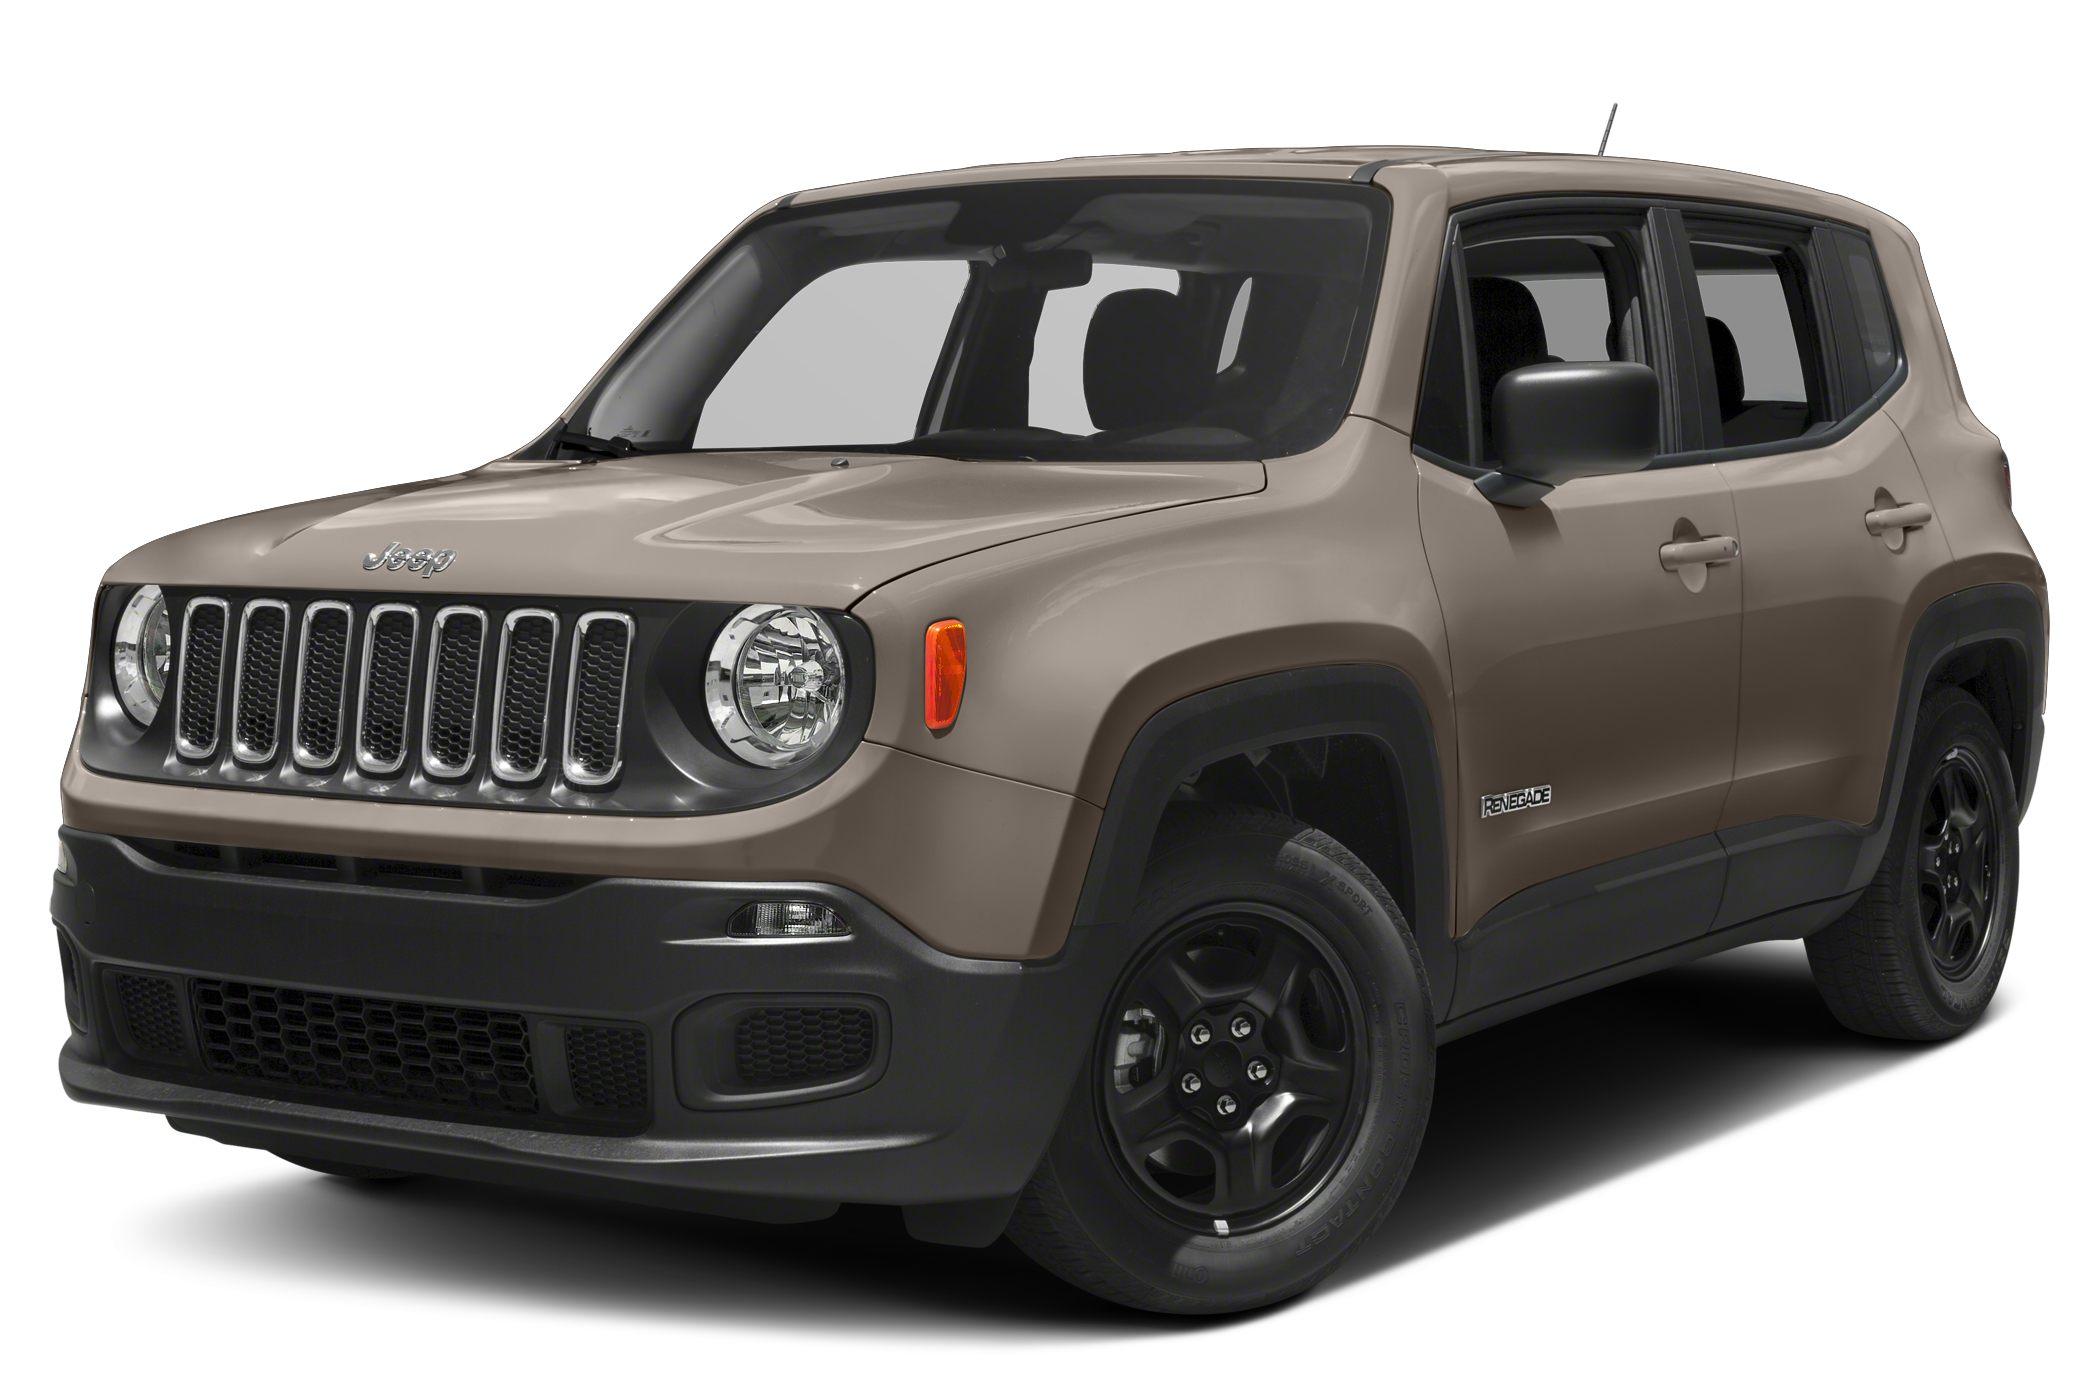 2017 Jeep Renegade - Keene, NH | Keene Chrysler Dodge Jeep Ram